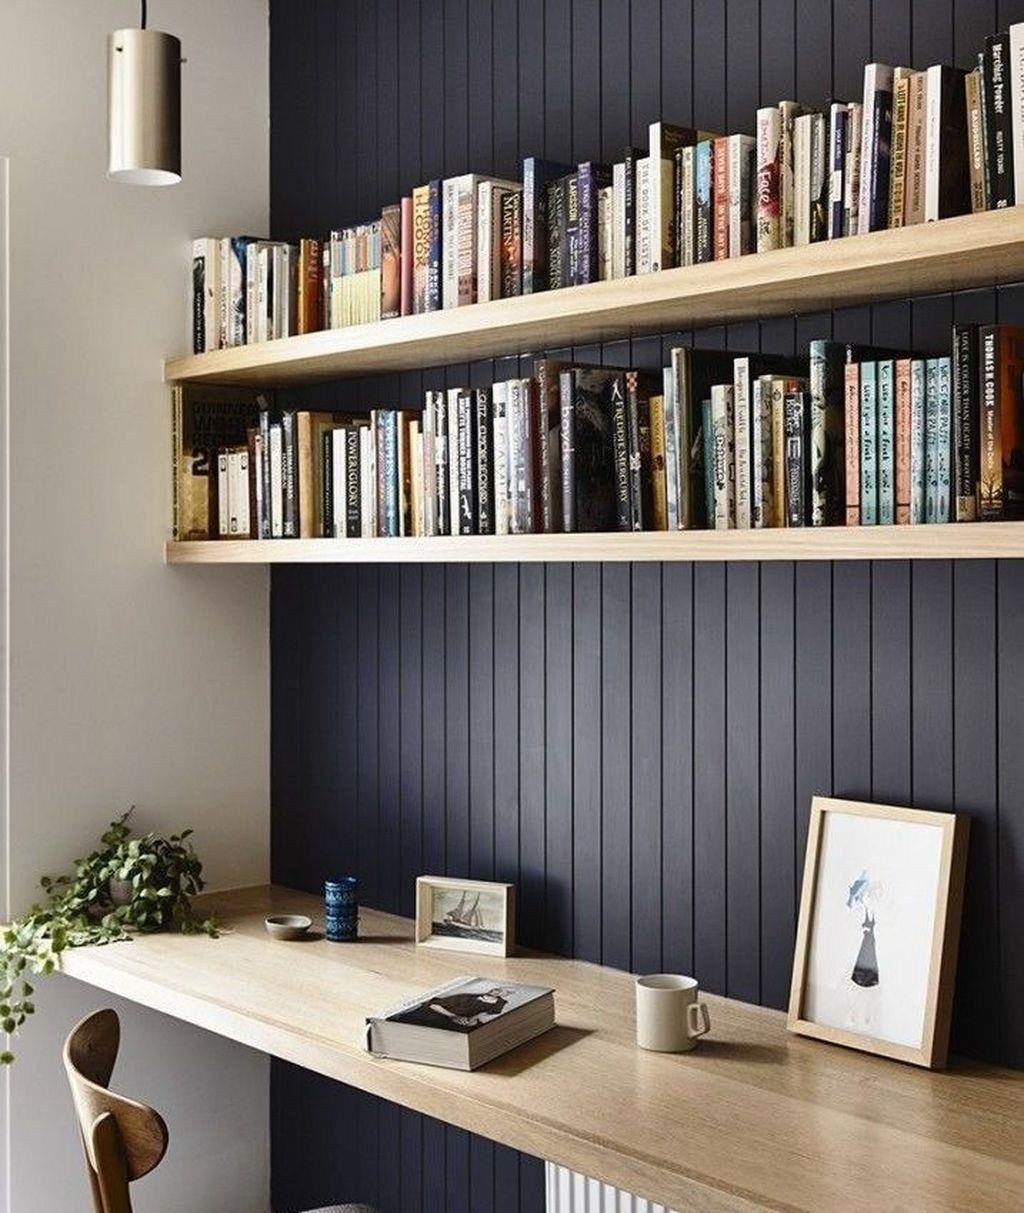 Cozy Workspace Bedroom Design And Decor Ideas 28 Shelf Decor